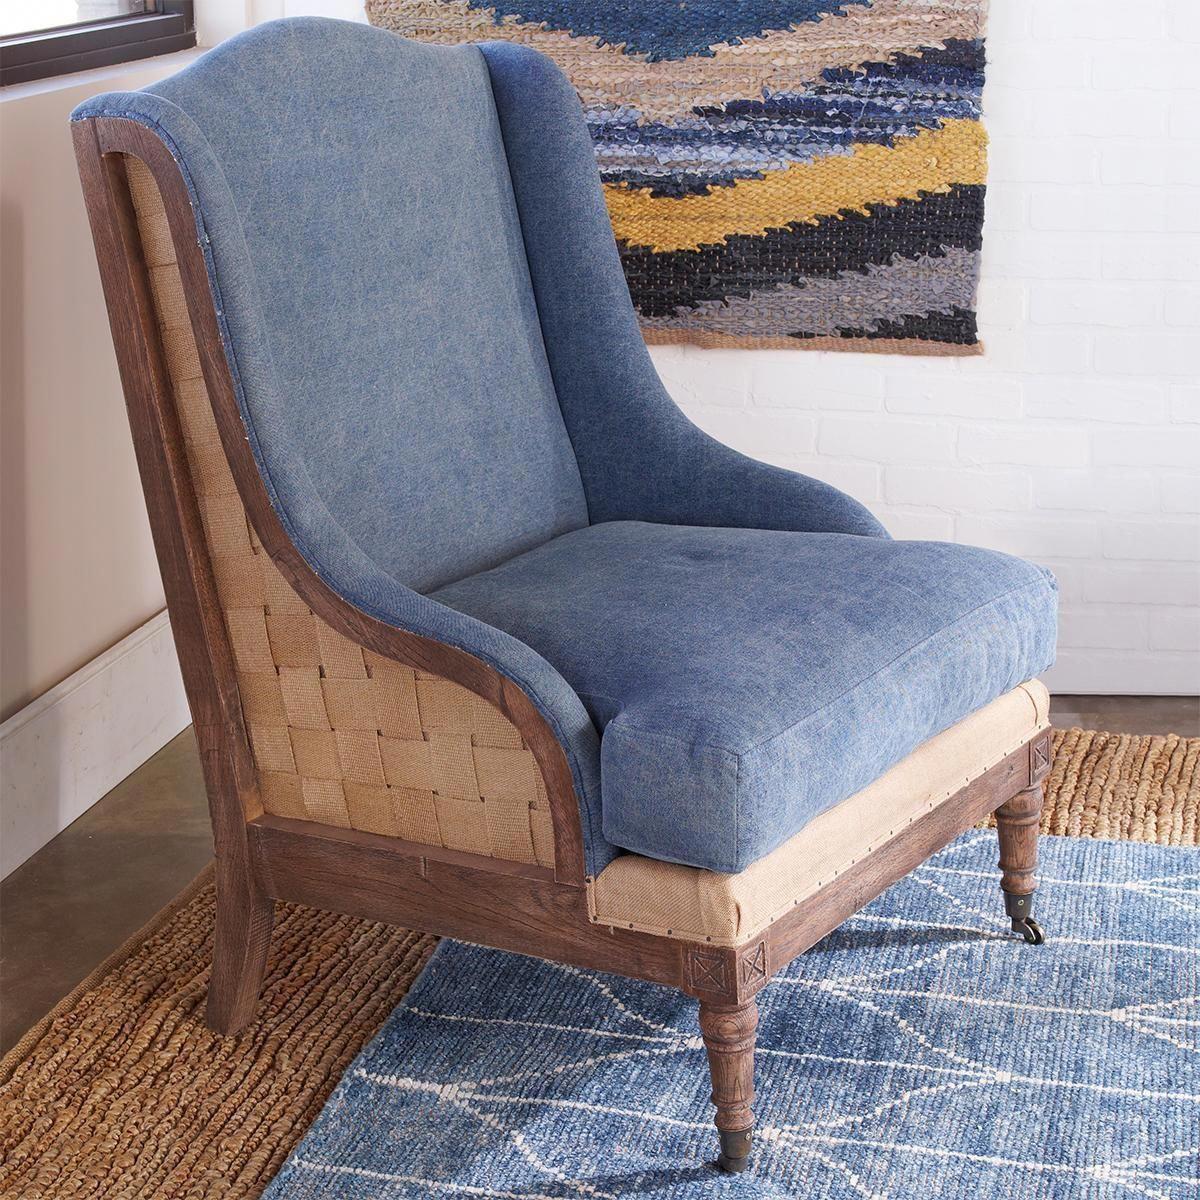 Patio Chair Cushions Clearance WingbackChair Wingback